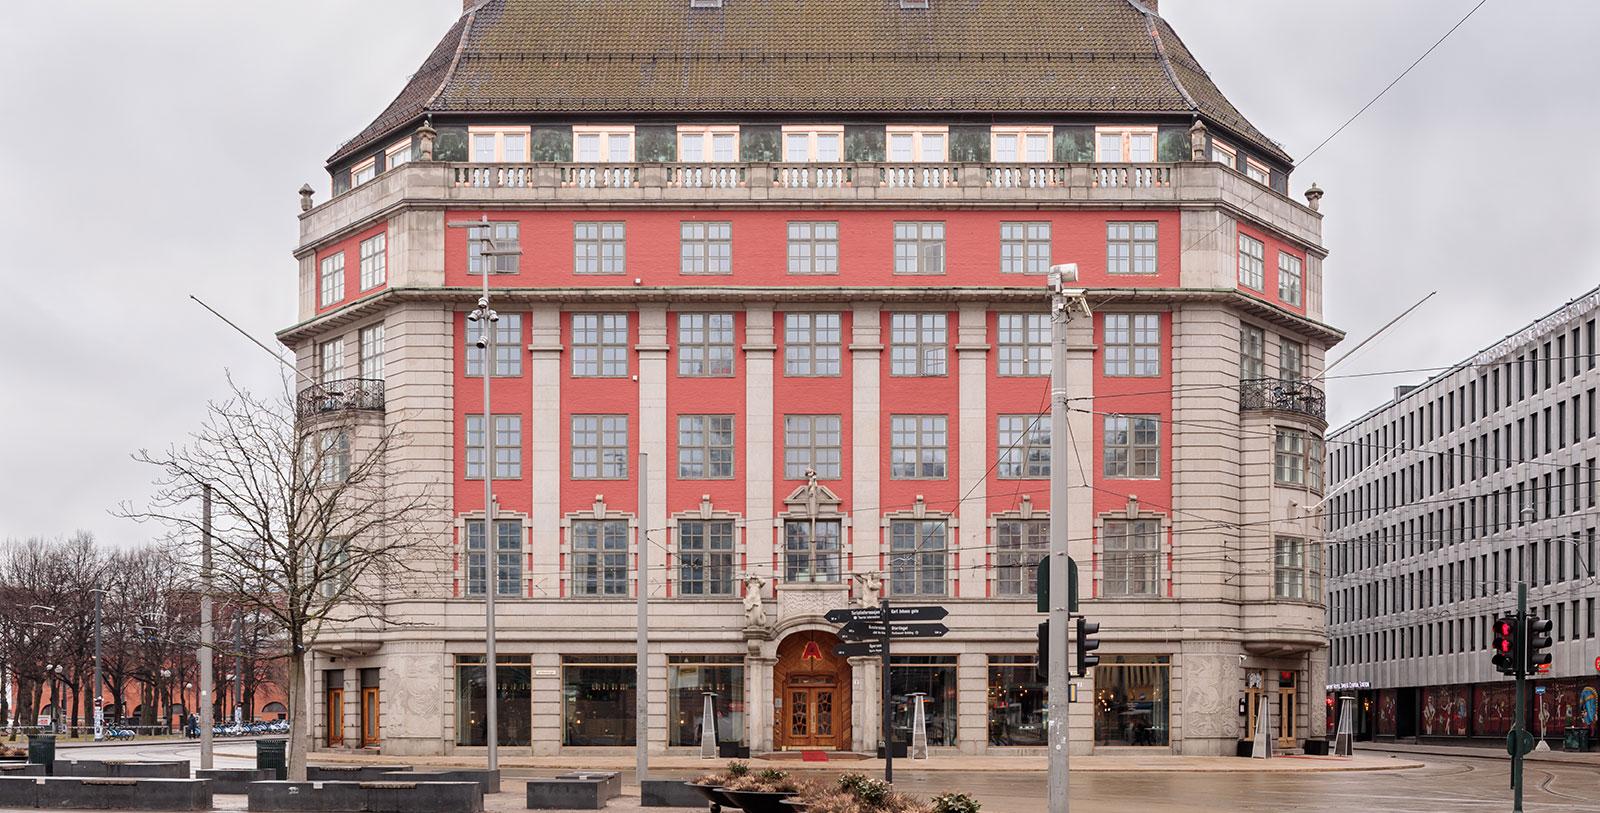 Image of hotel exterior Amerikalinjen, 1919, Member of Historic Hotels Worldwide, in Oslo, Norway, Overview